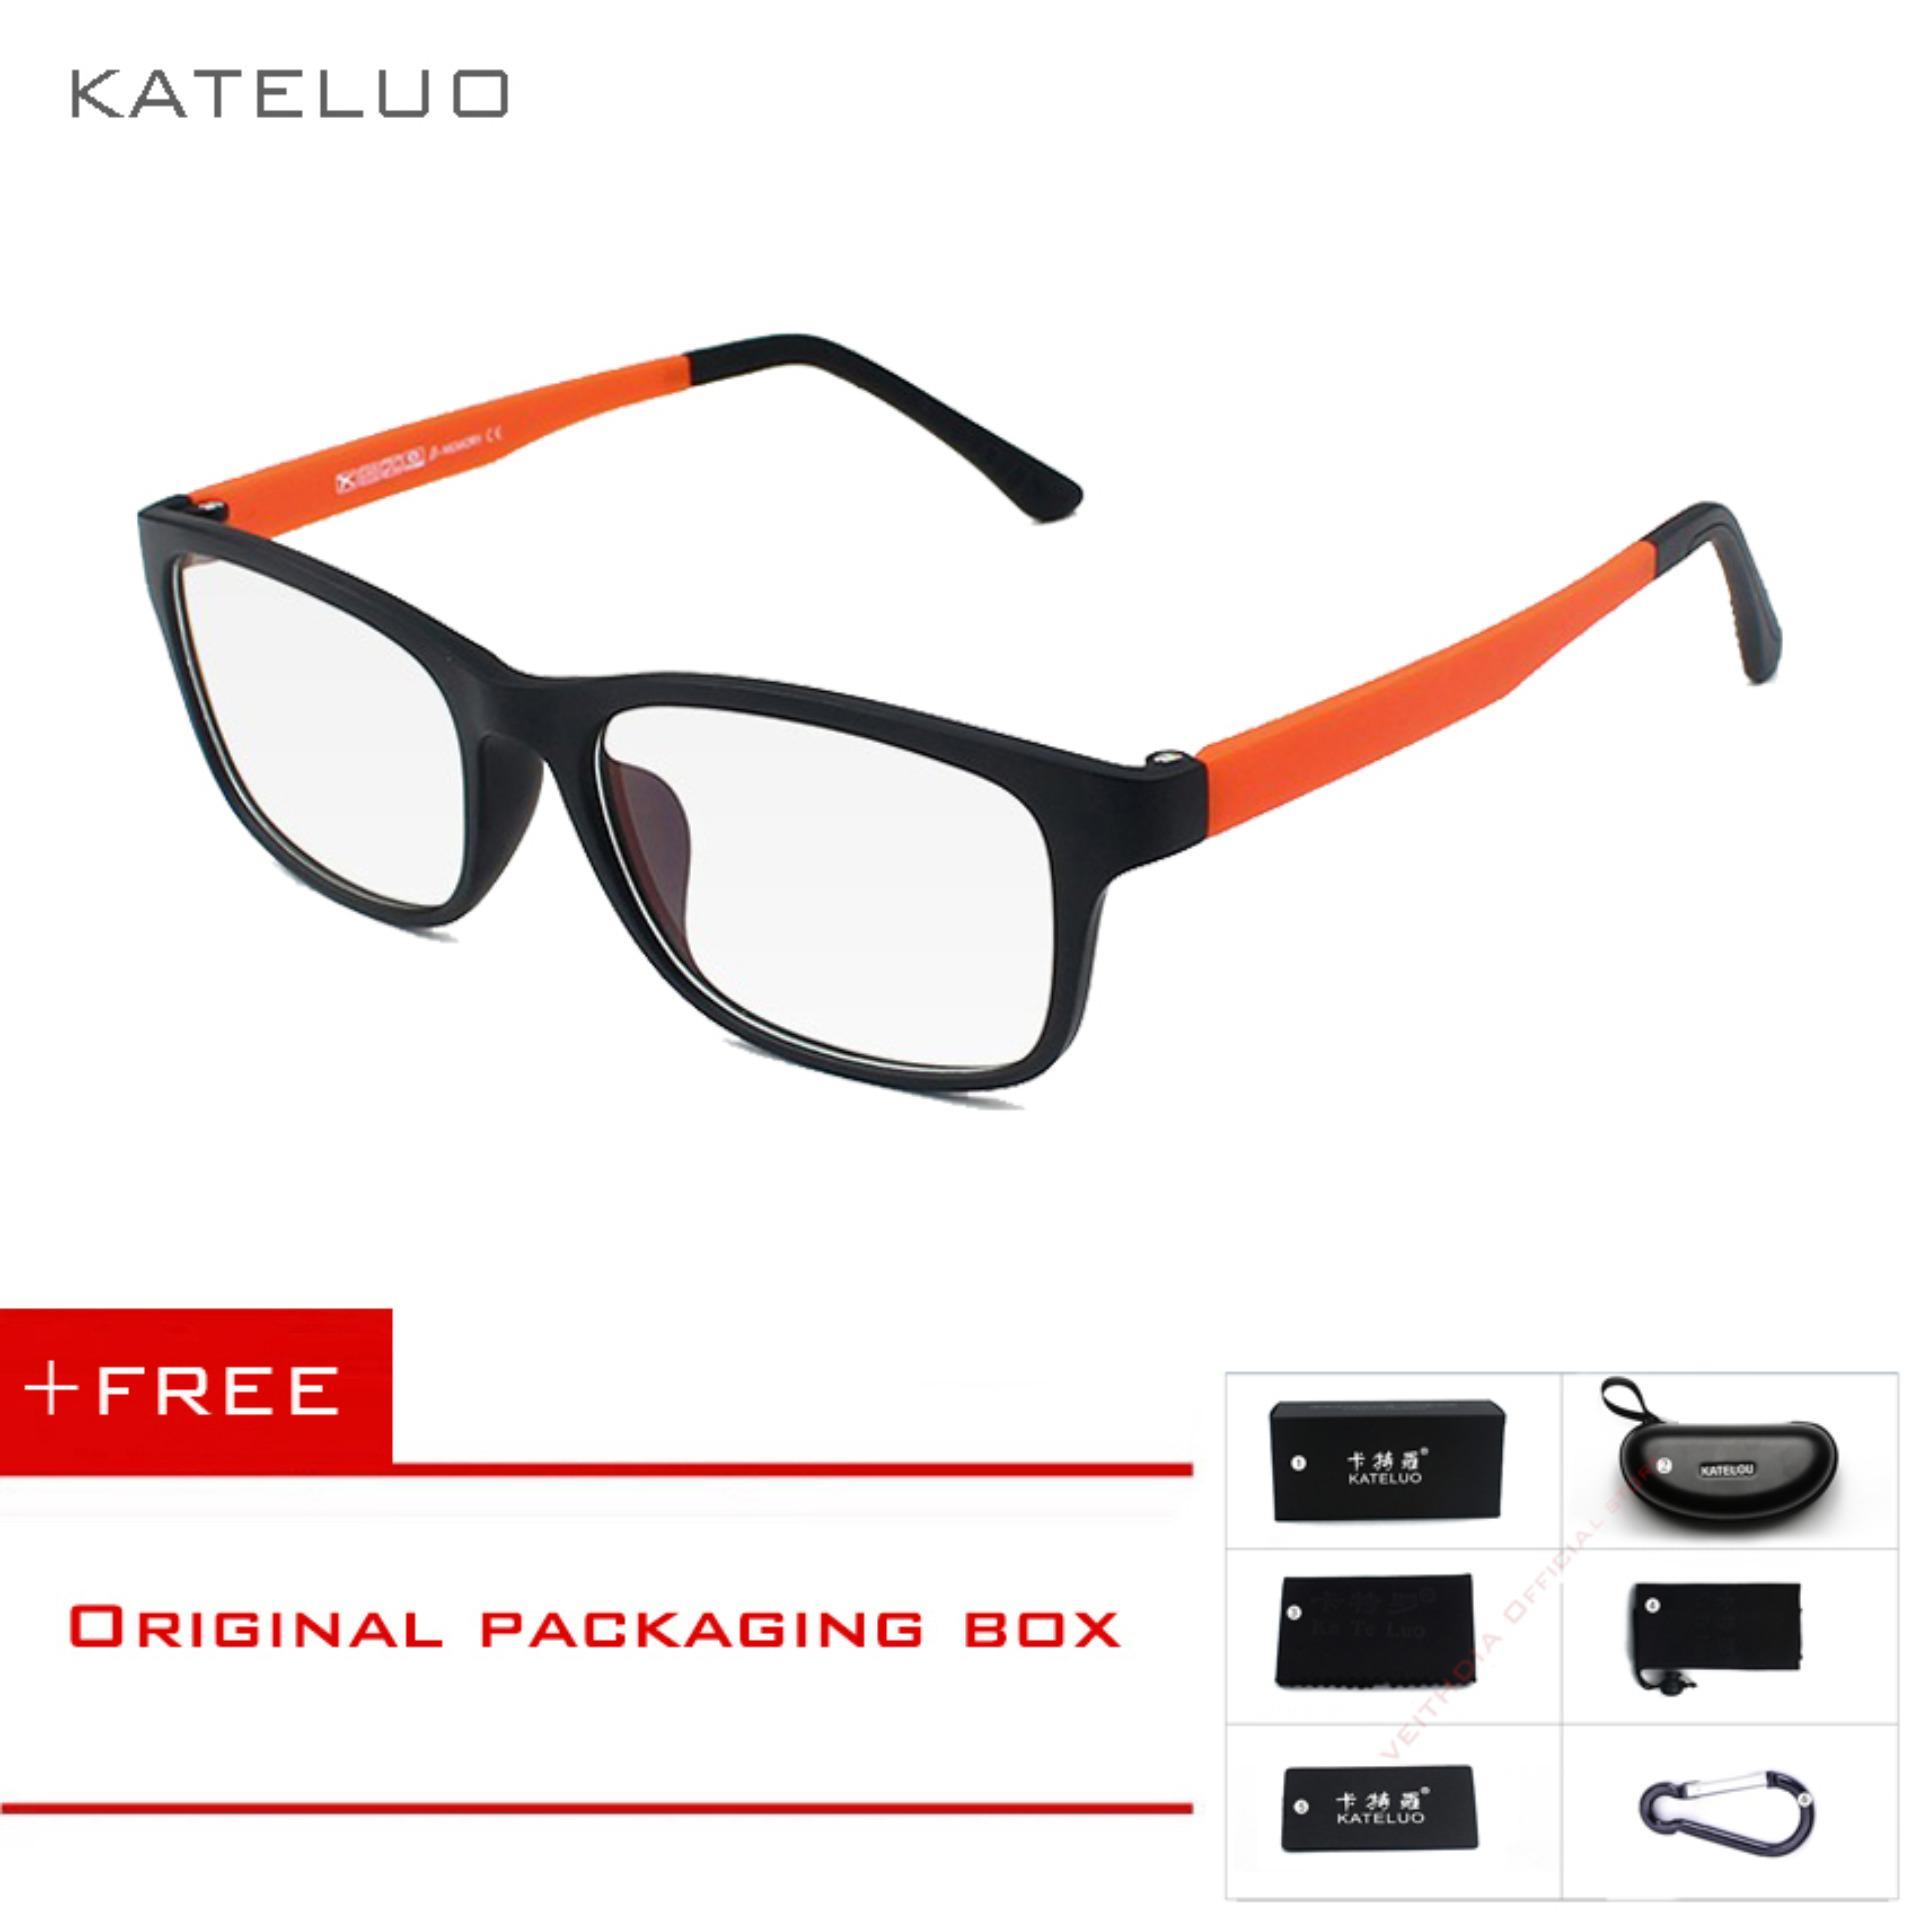 KATELUO TR90 Anti-Komputer Biru Kelelahan Laser Radiasi-tahan Kacamata Kacamata Bingkai Oculos Di Grau De 9219 (oranye) [membeli 1 Mendapatkan 1 Hadiah]